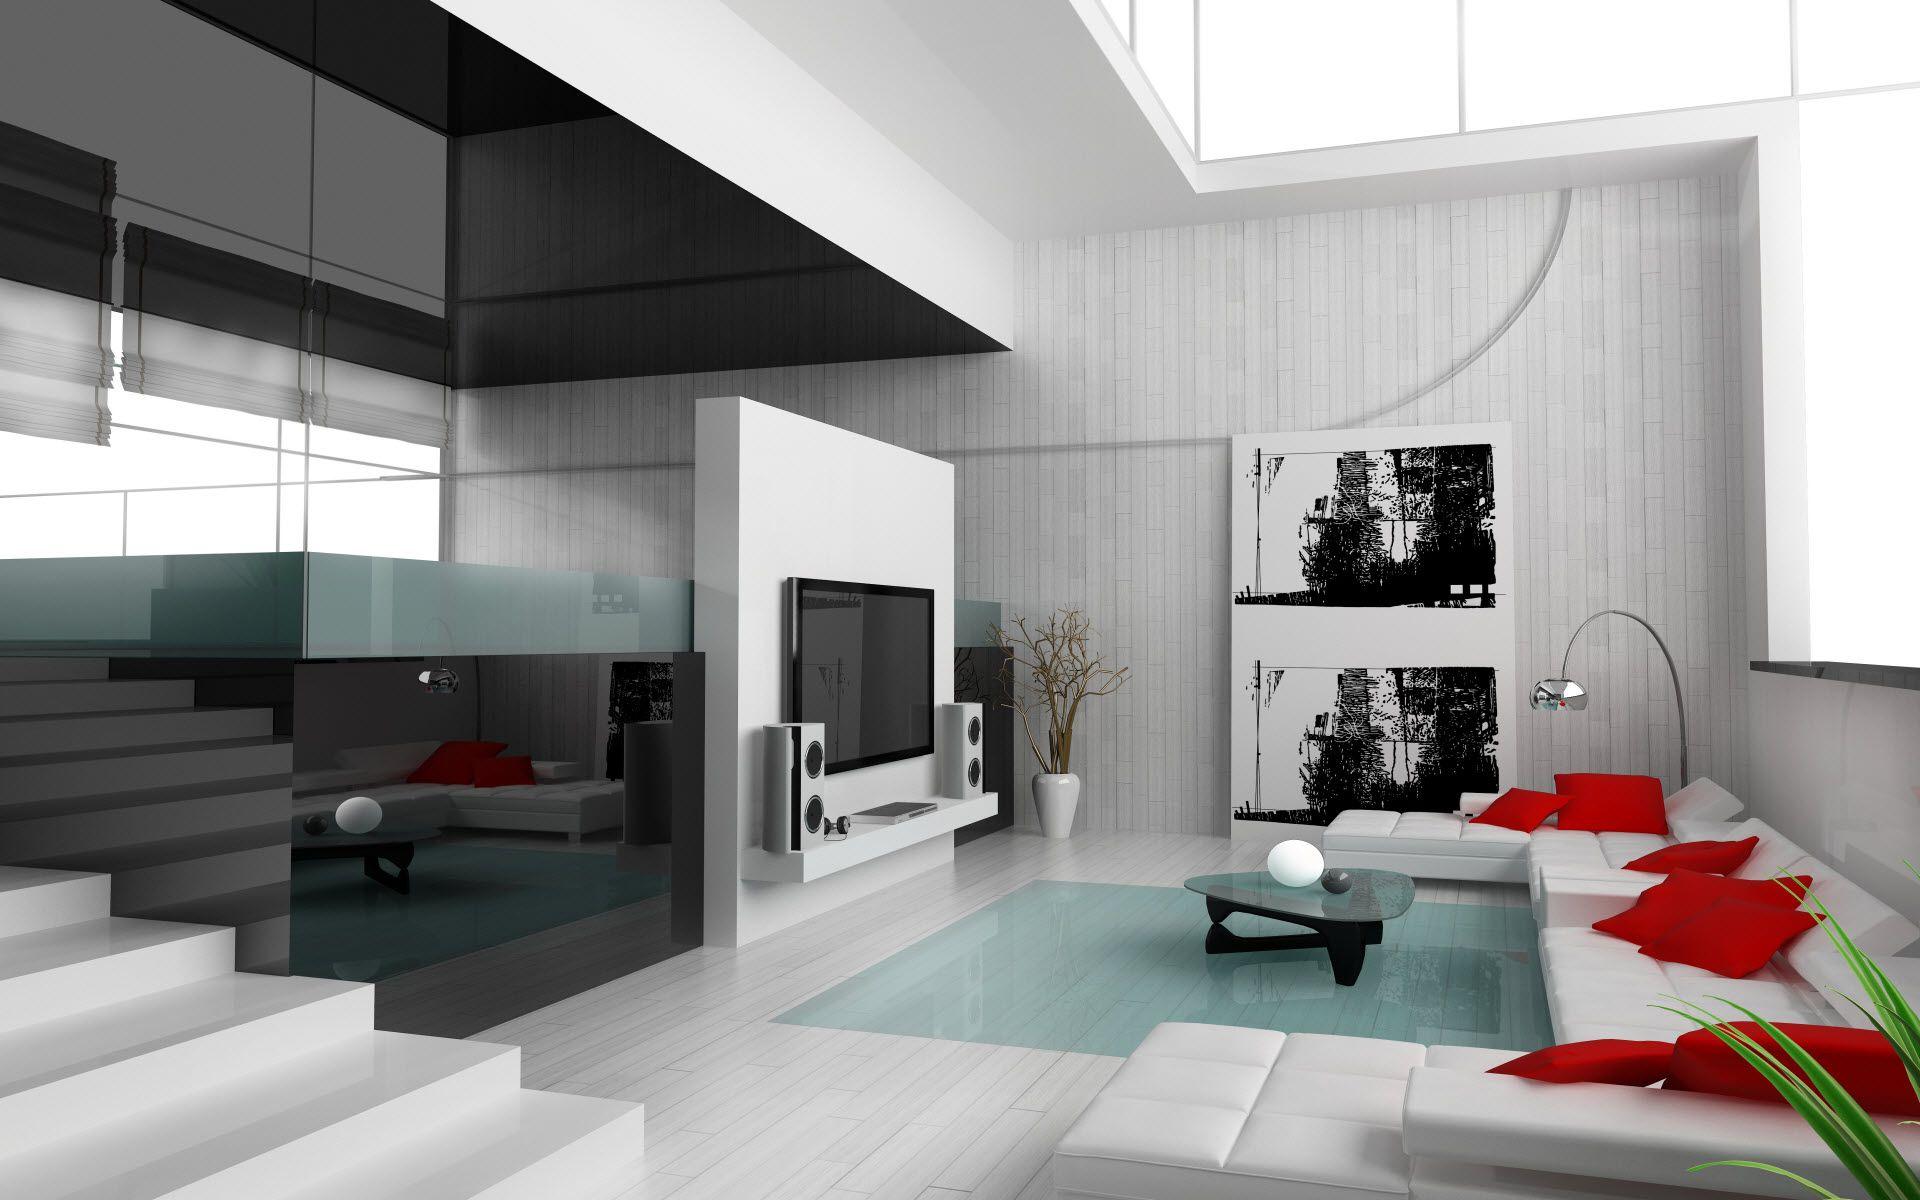 beautiful house hd wallpapers 5jpg 1920x1200